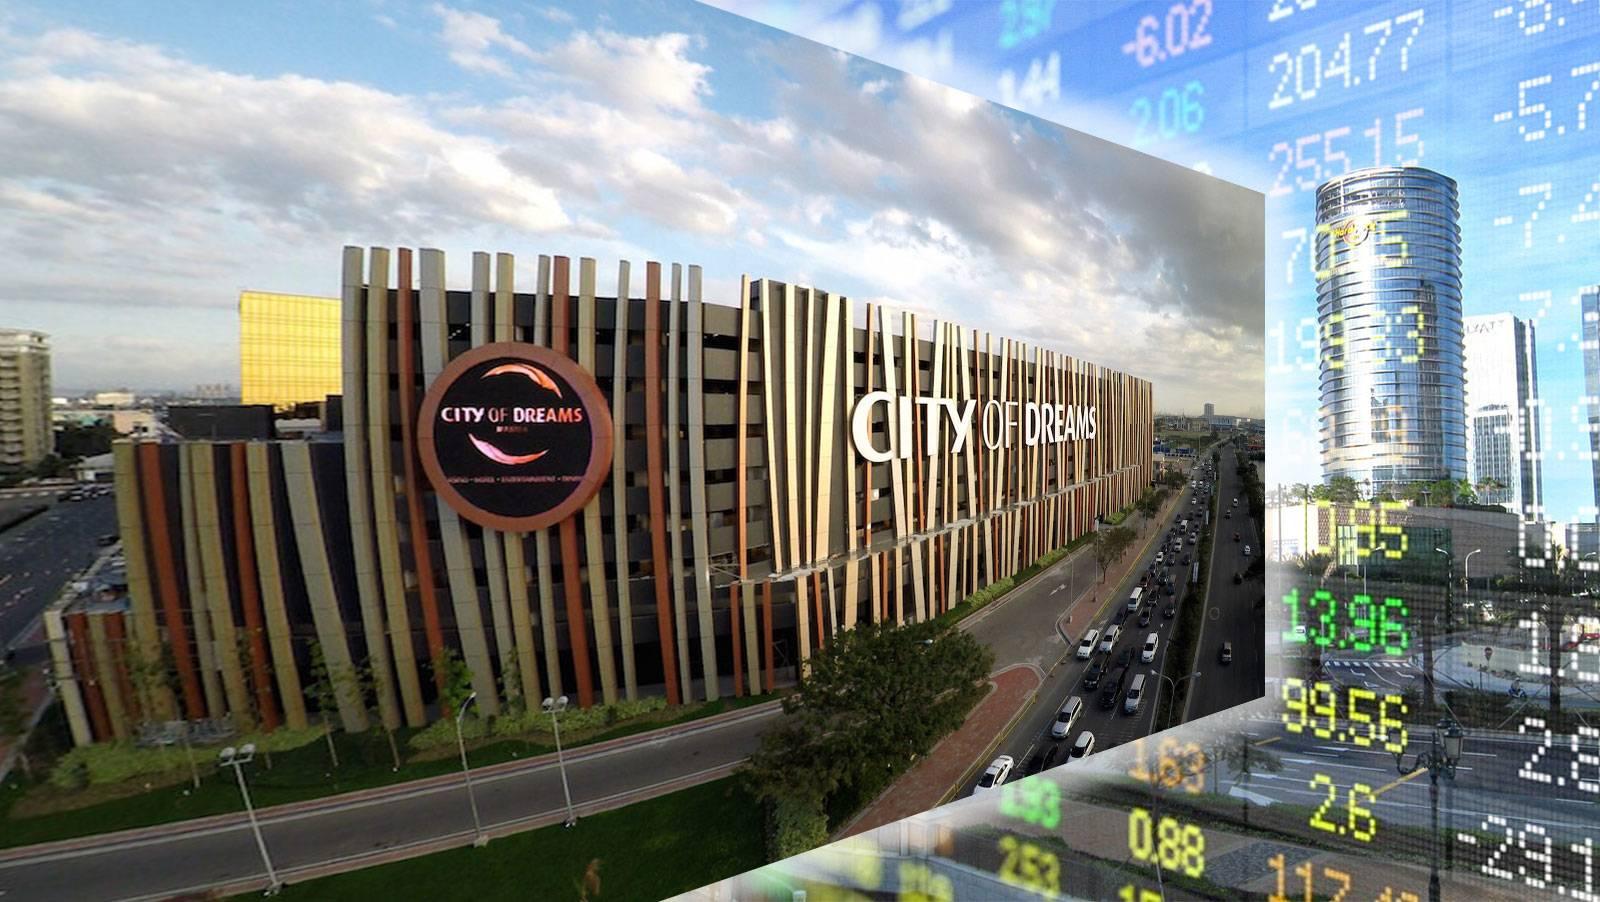 Macau, Philippines lift Melco Resorts Q3 earnings